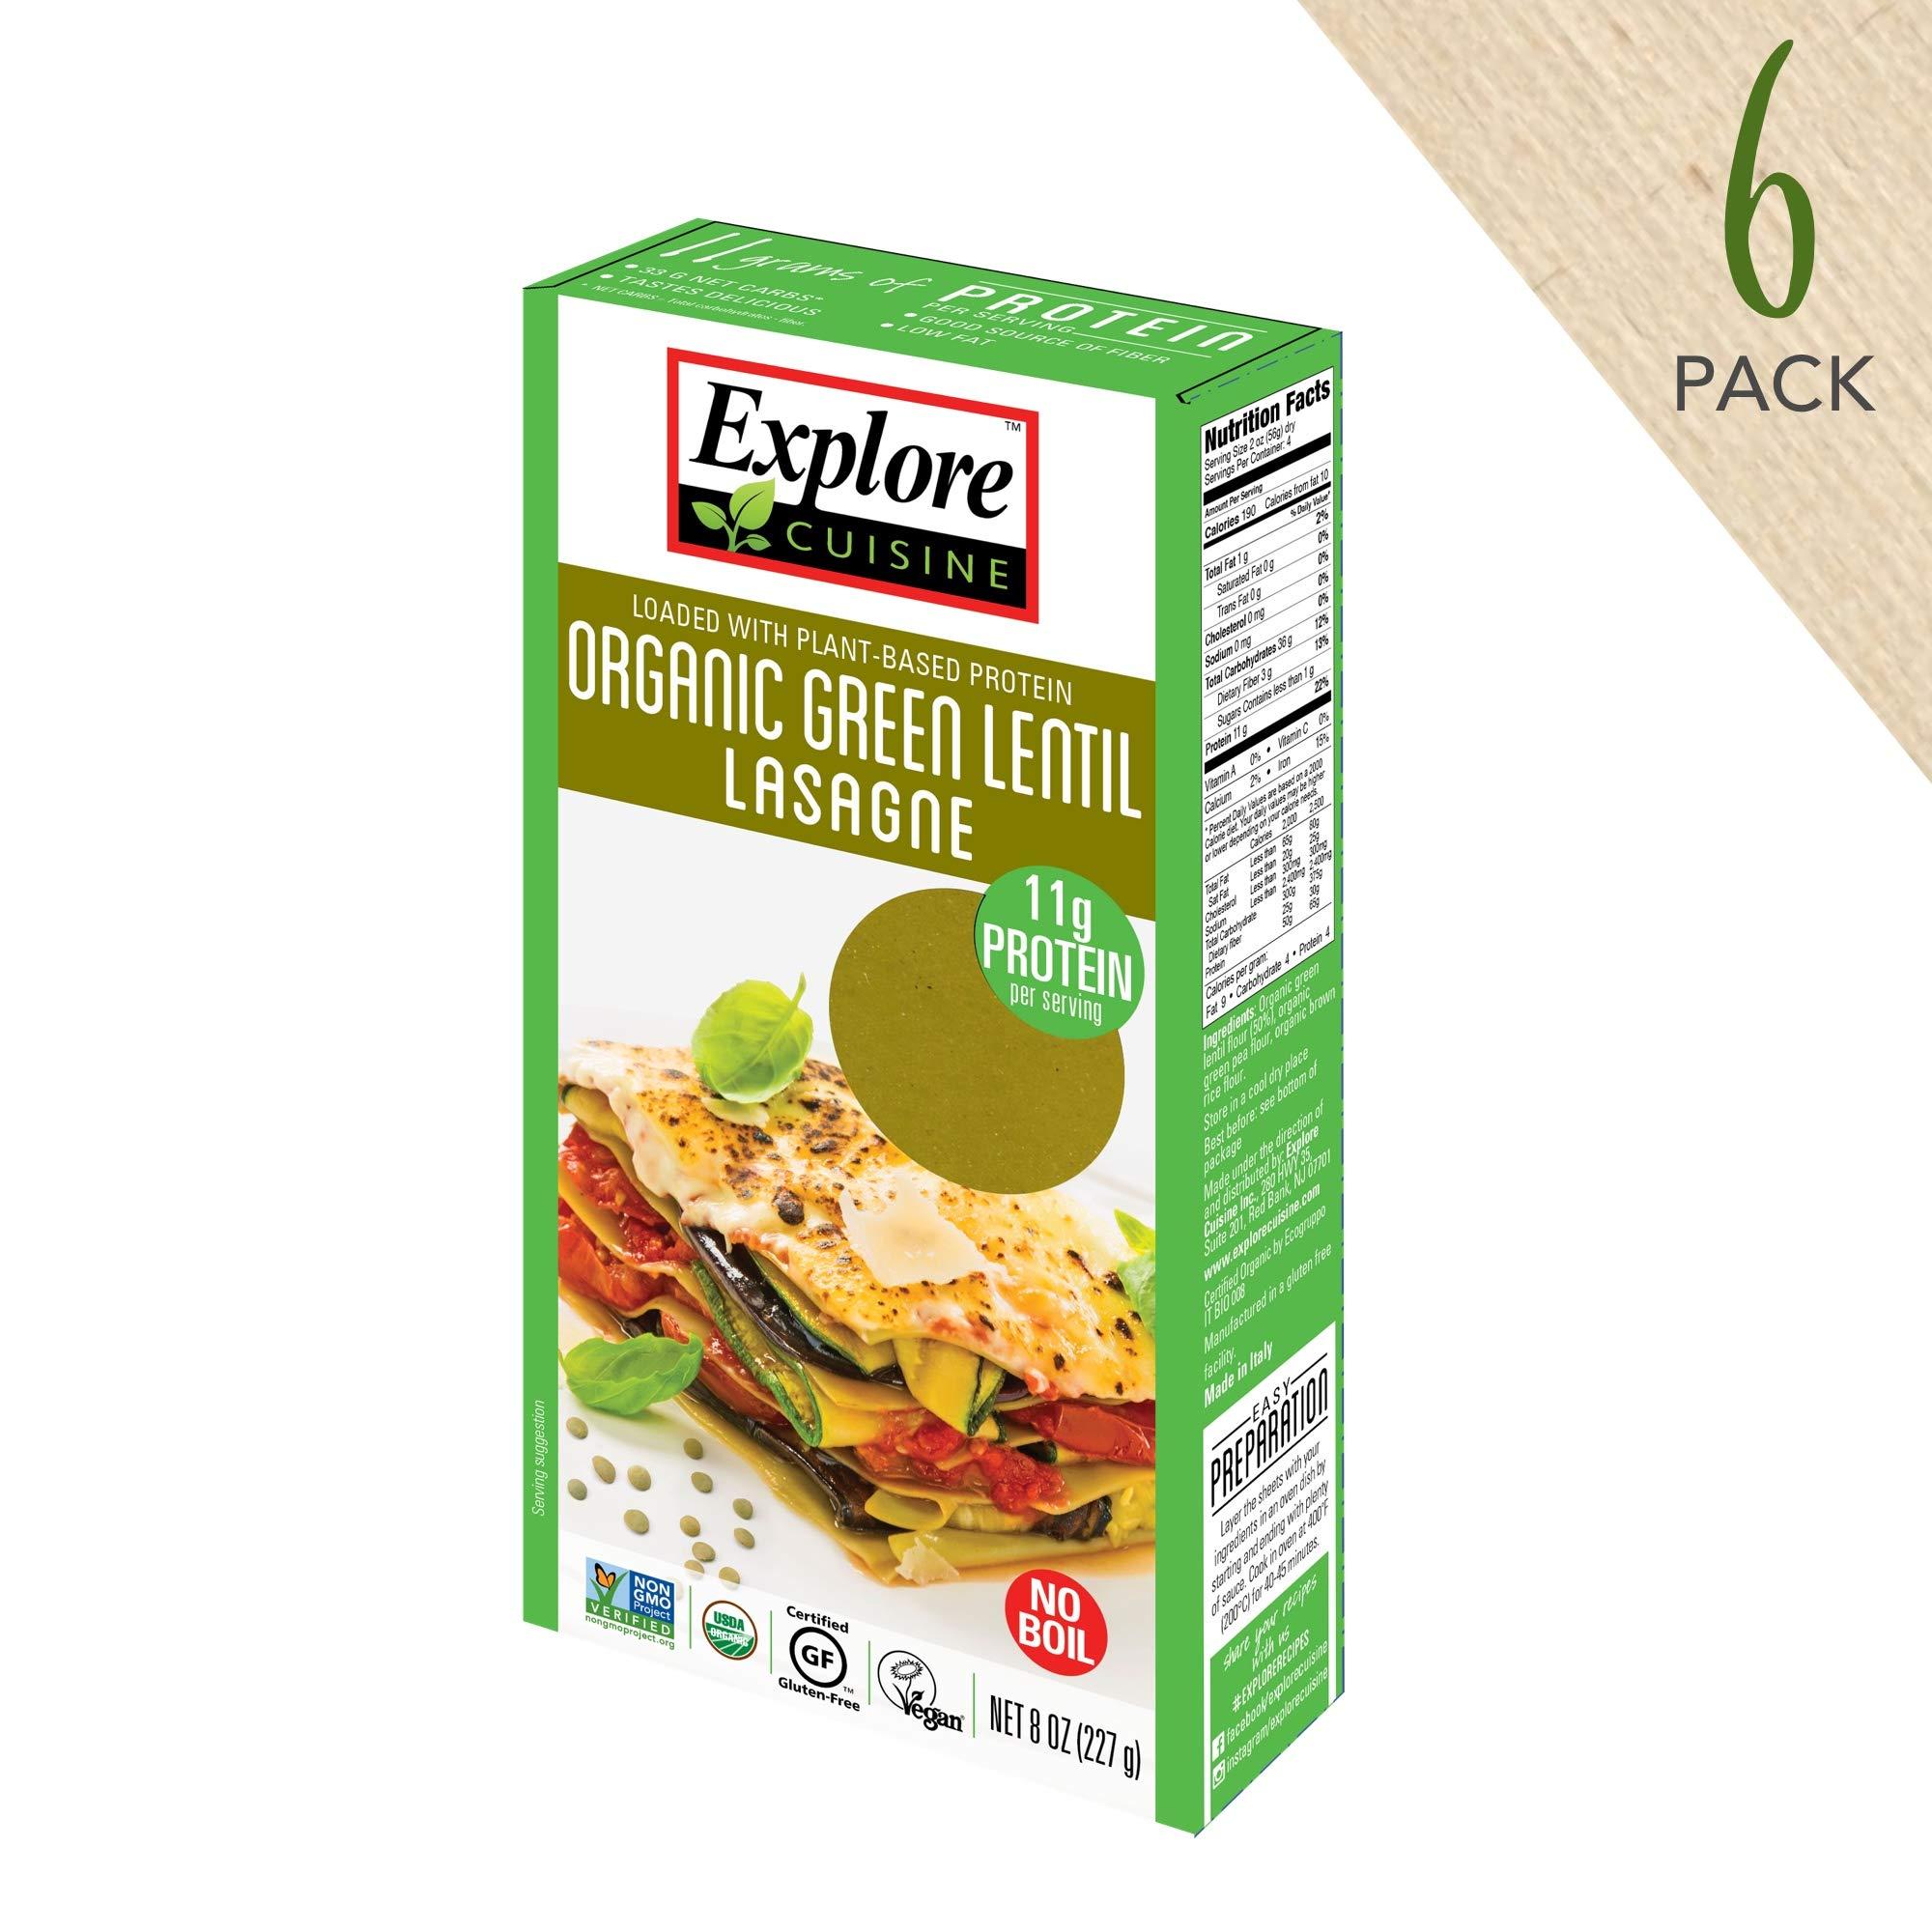 Amazoncom Explore Cuisine Organic Green Lentil Lasagne 6 Pack